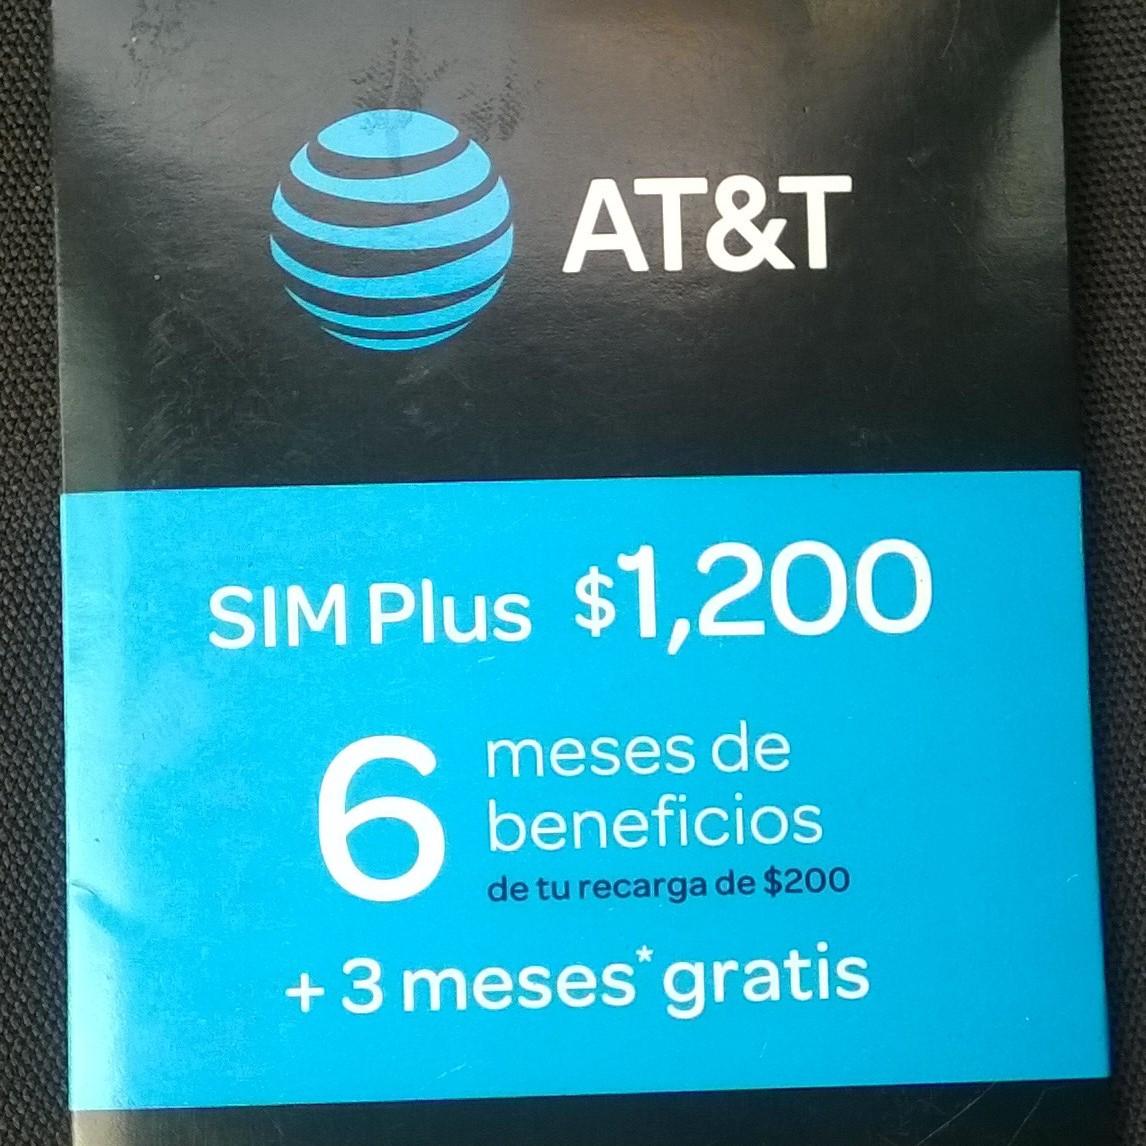 Walmart Xalapa: Sim Plus AT&T 9 Meses a $595.01